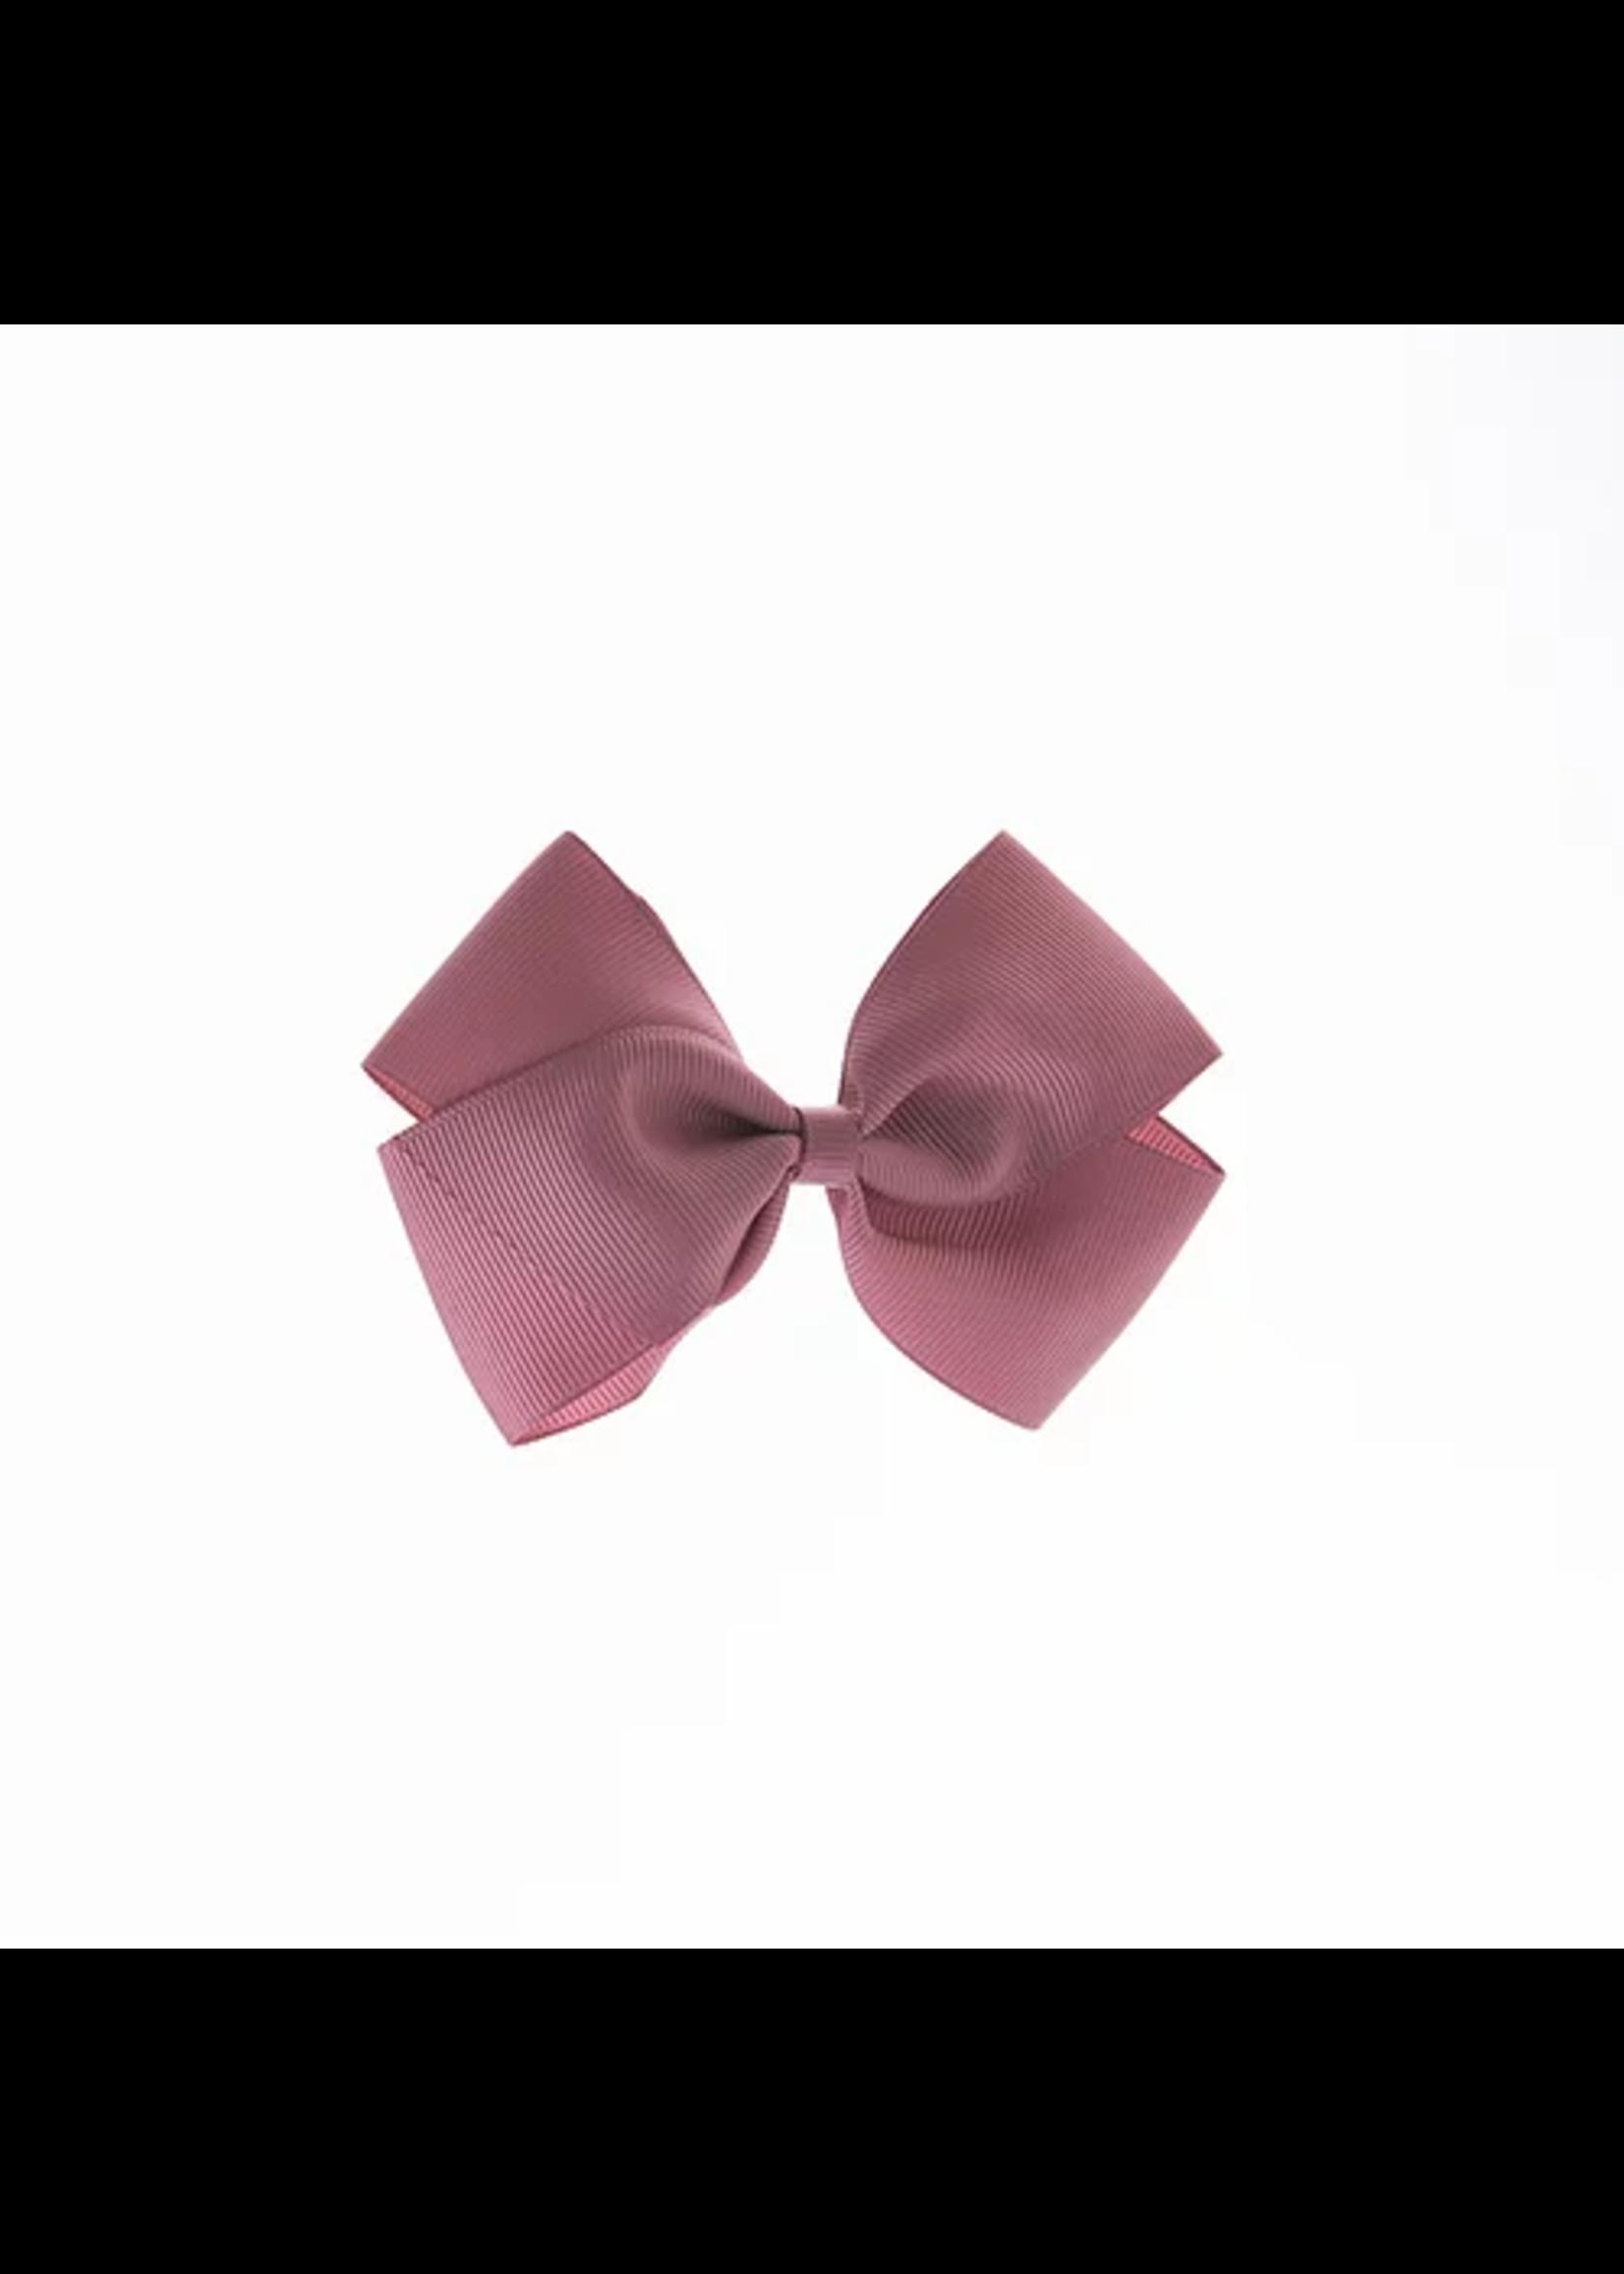 olilia Olilia Medium London Bow (Rosy Mauve)